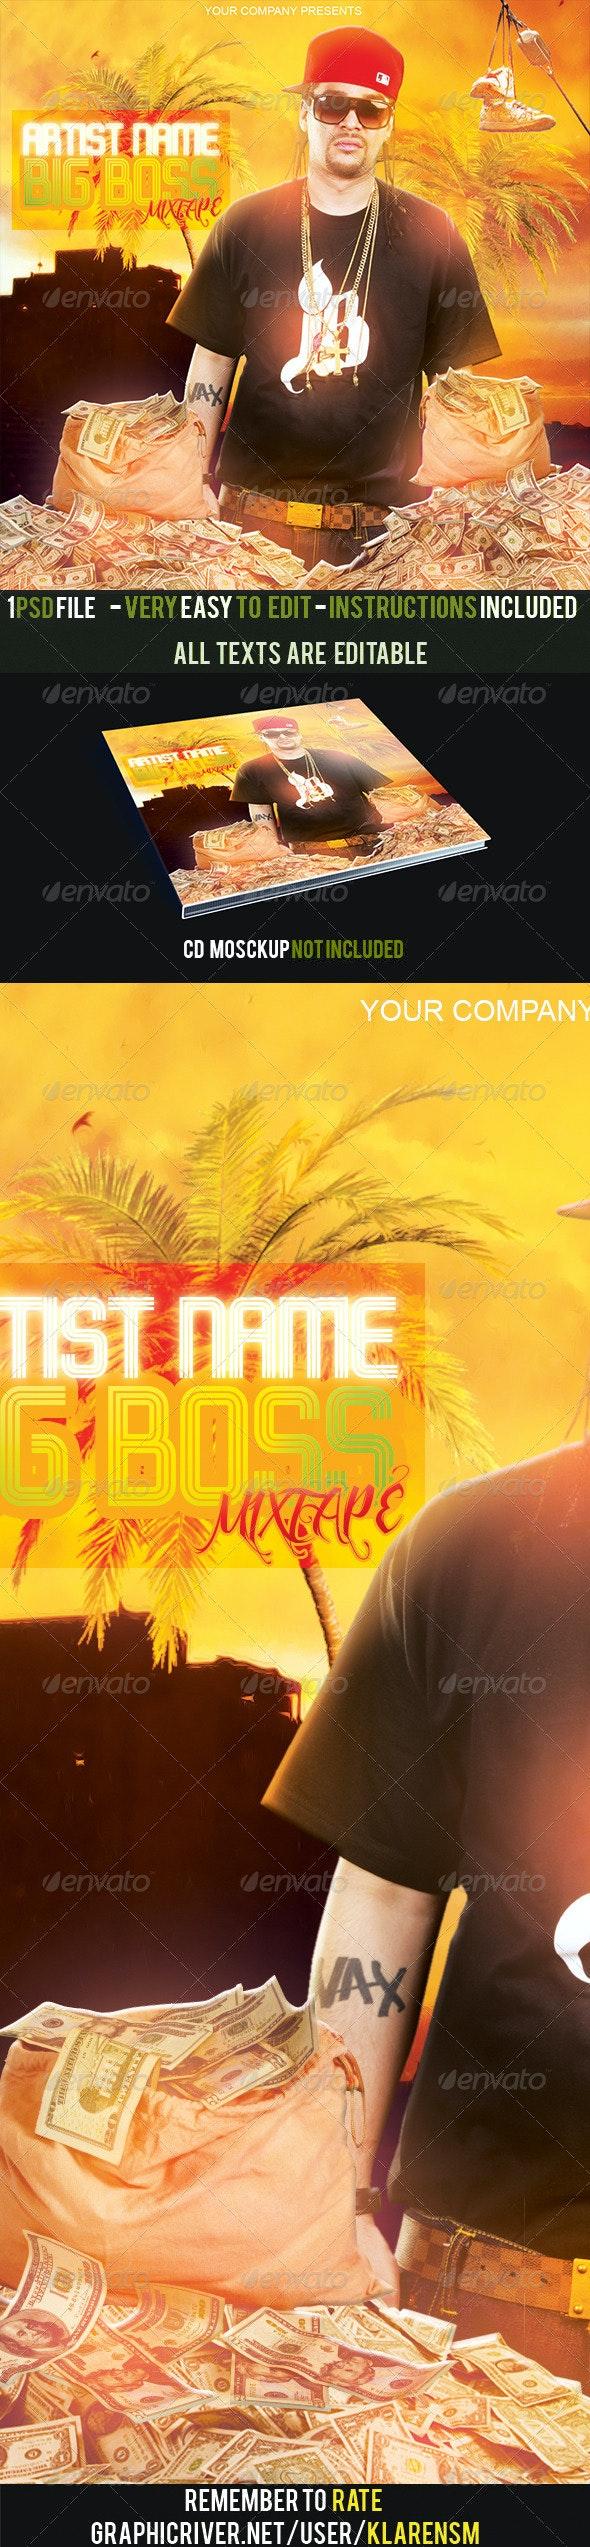 Big Boss Hip Hop Album Mixtape CD Cover Template - CD & DVD Artwork Print Templates